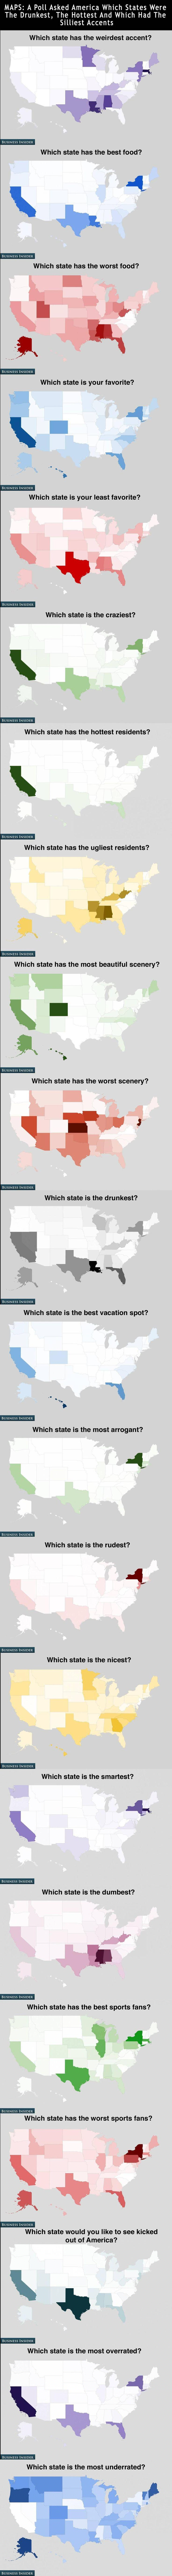 Best vs. Worst States #mapgeek @BadgerMaps